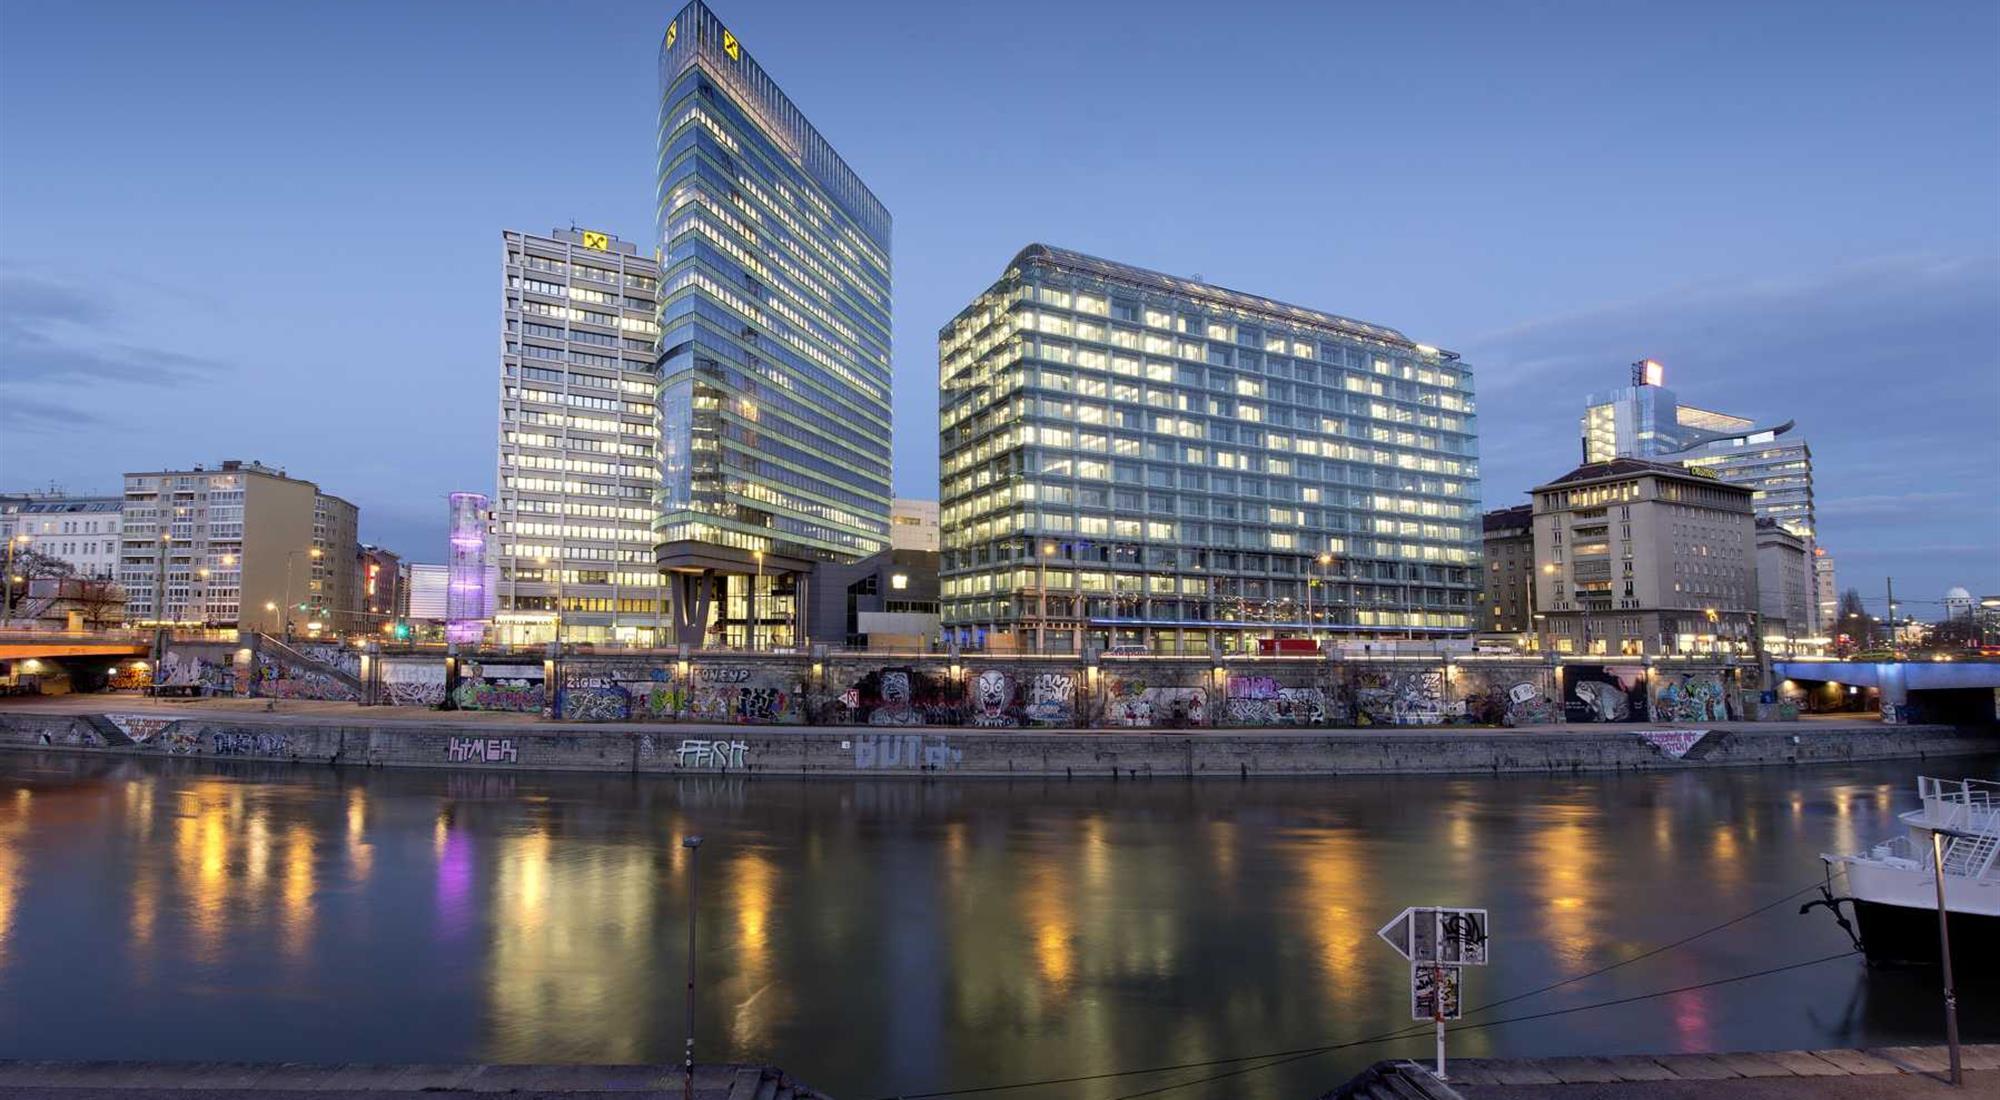 https://alukoenigstahl.mk/wp-content/uploads/2020/09/2013-02-EOD-Tower-Wien-13.jpg